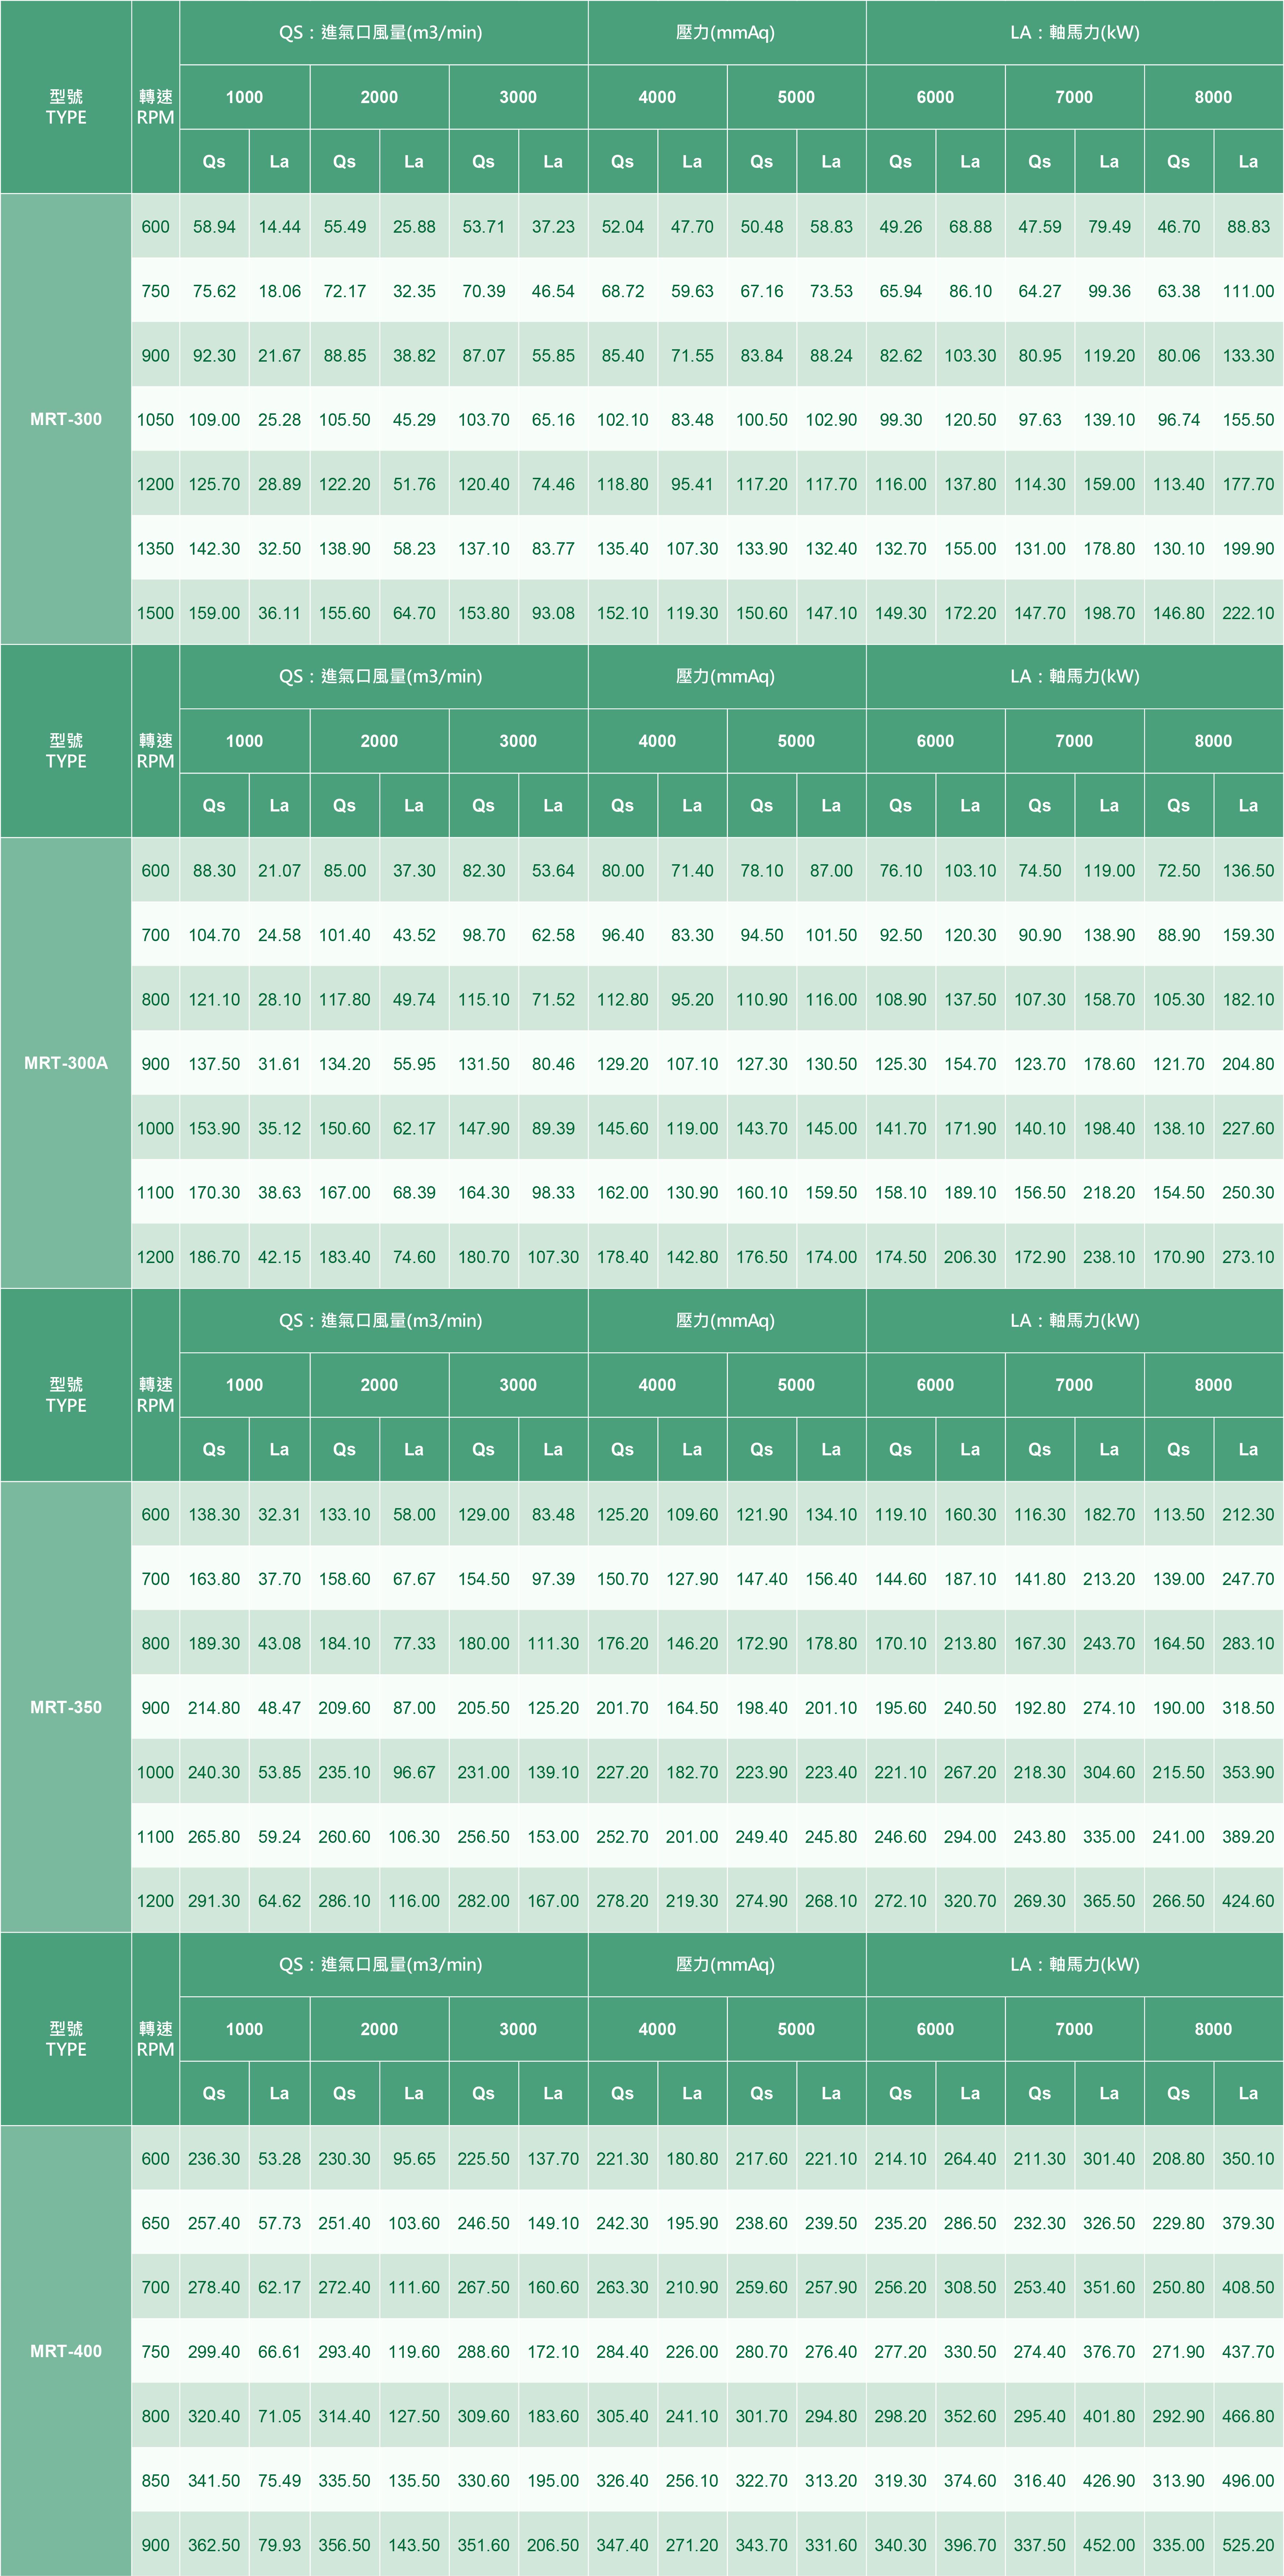 BLOWTACロバストブロワーMRTシリーズ性能表(加圧式)